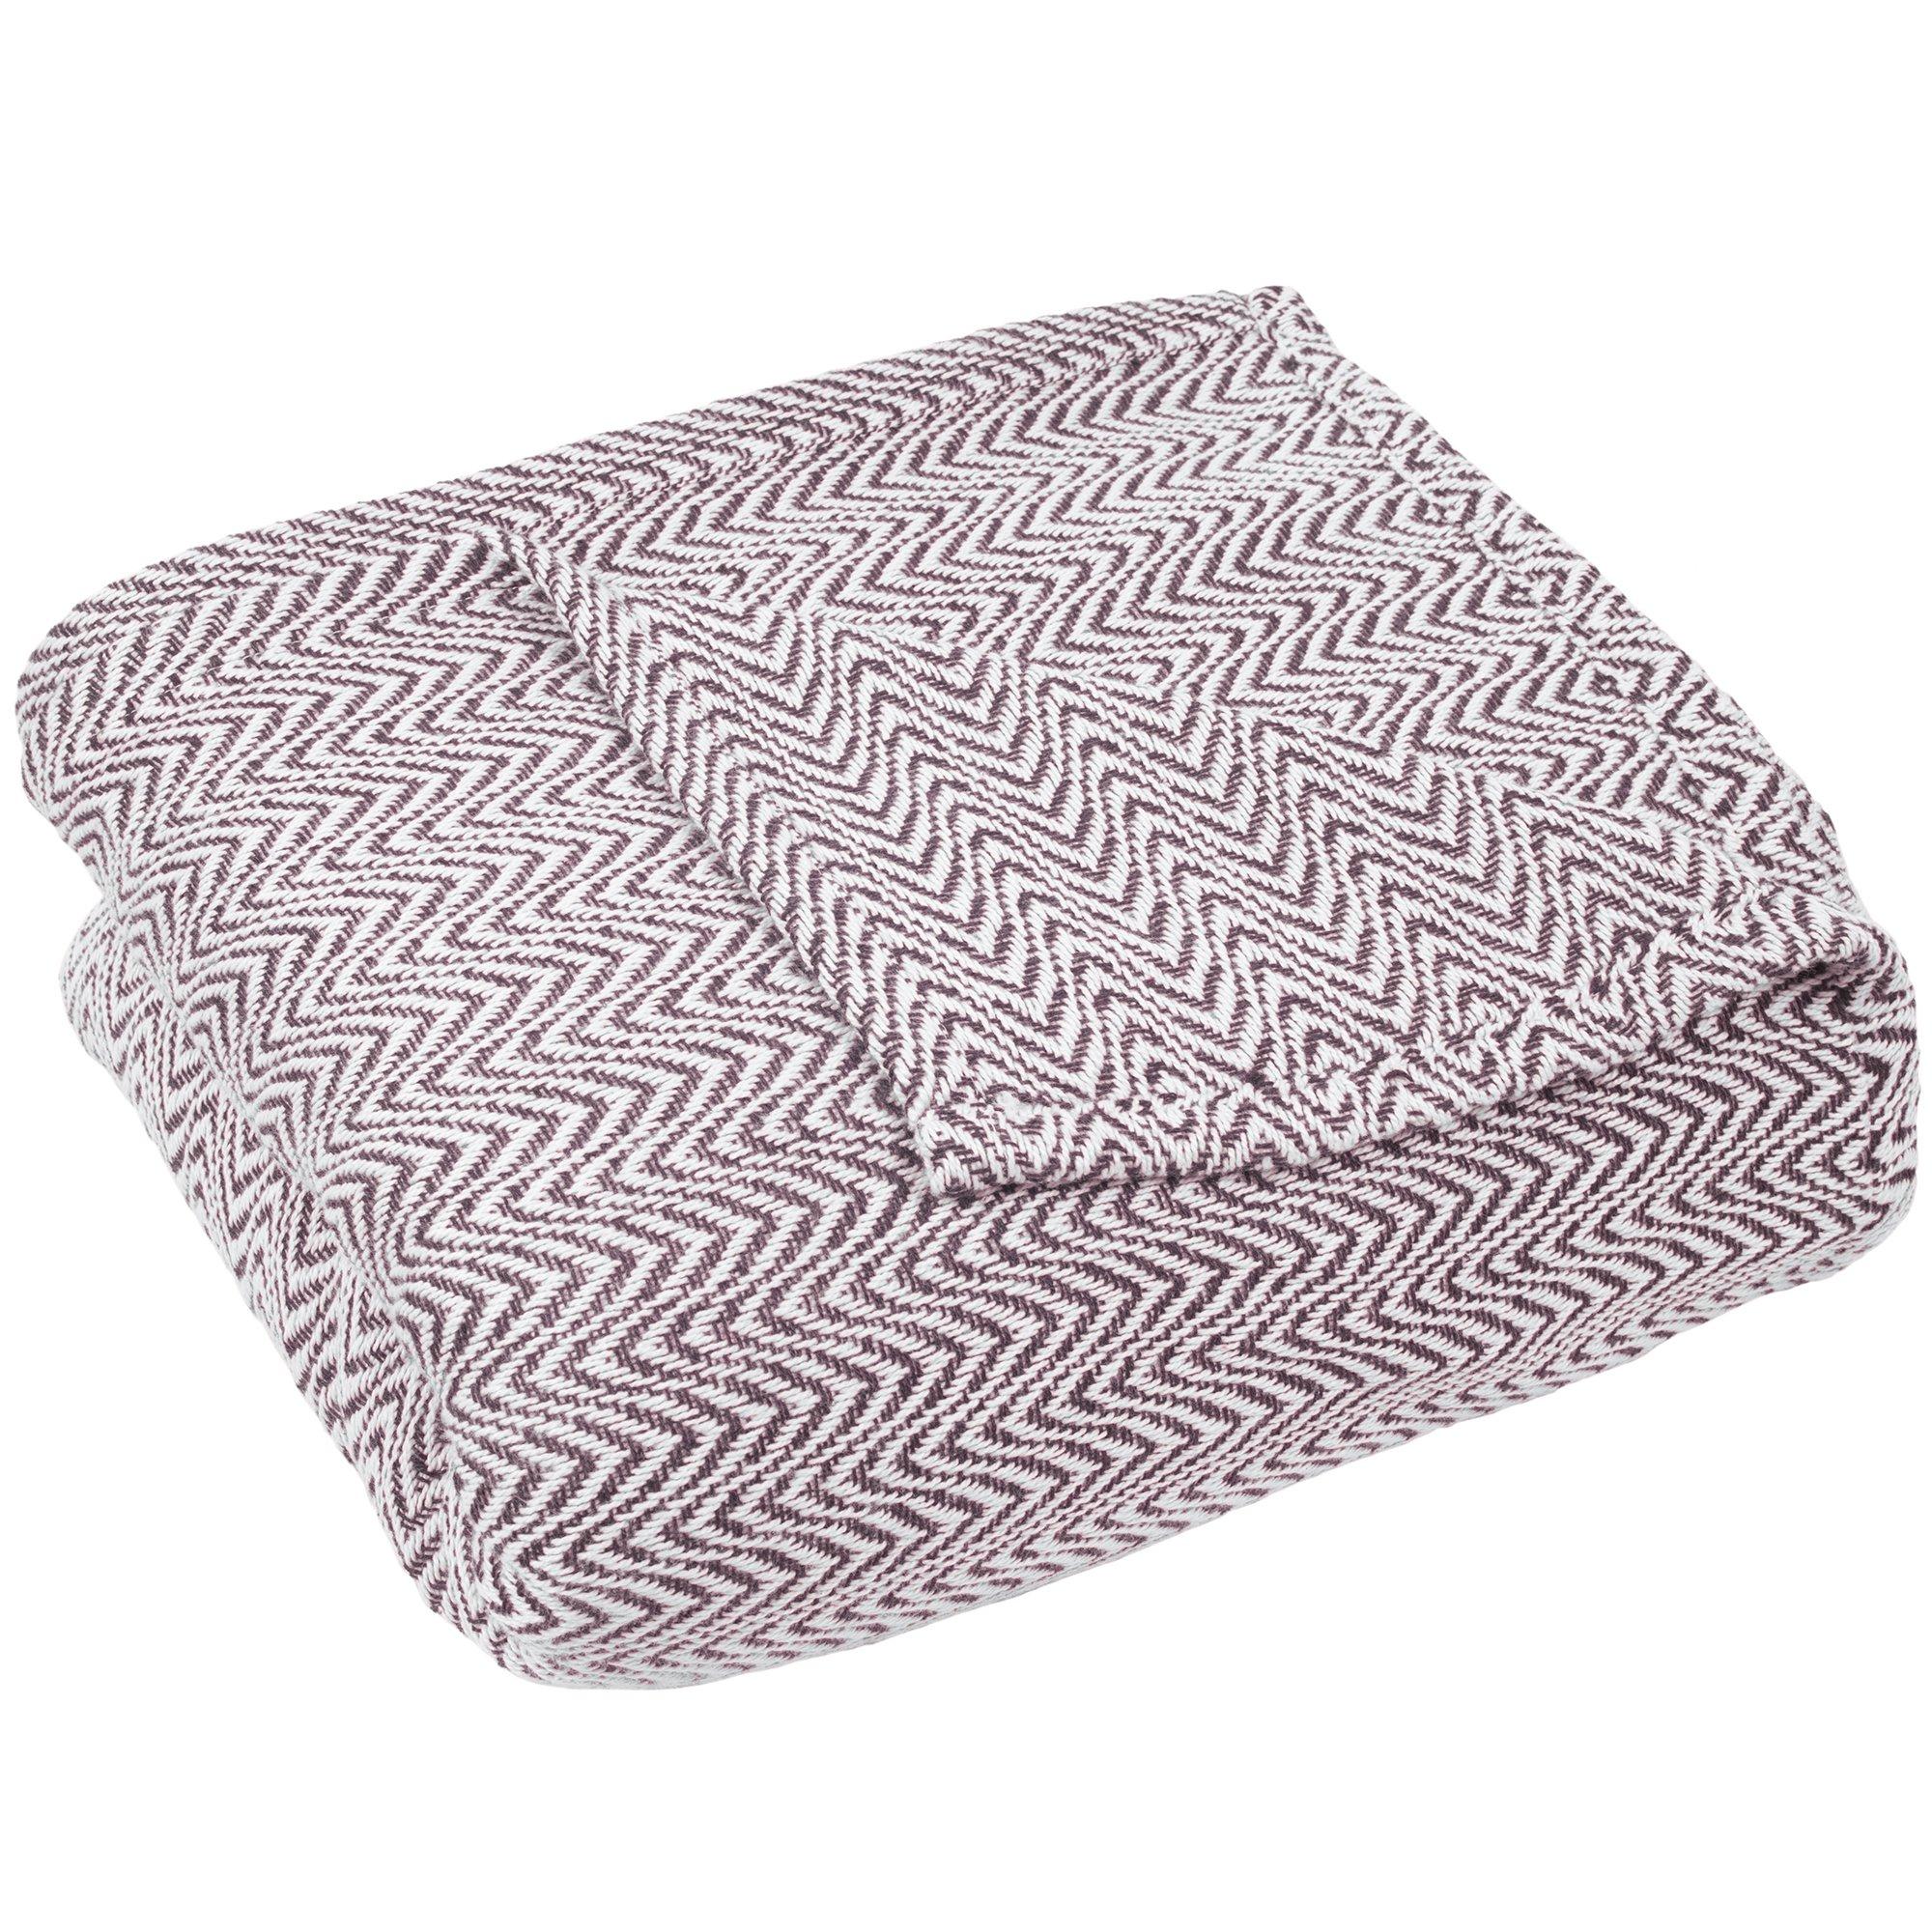 Blanket-100% Cotton King Chevron Luxury Soft Blanket by Lavish Home - Burgundy